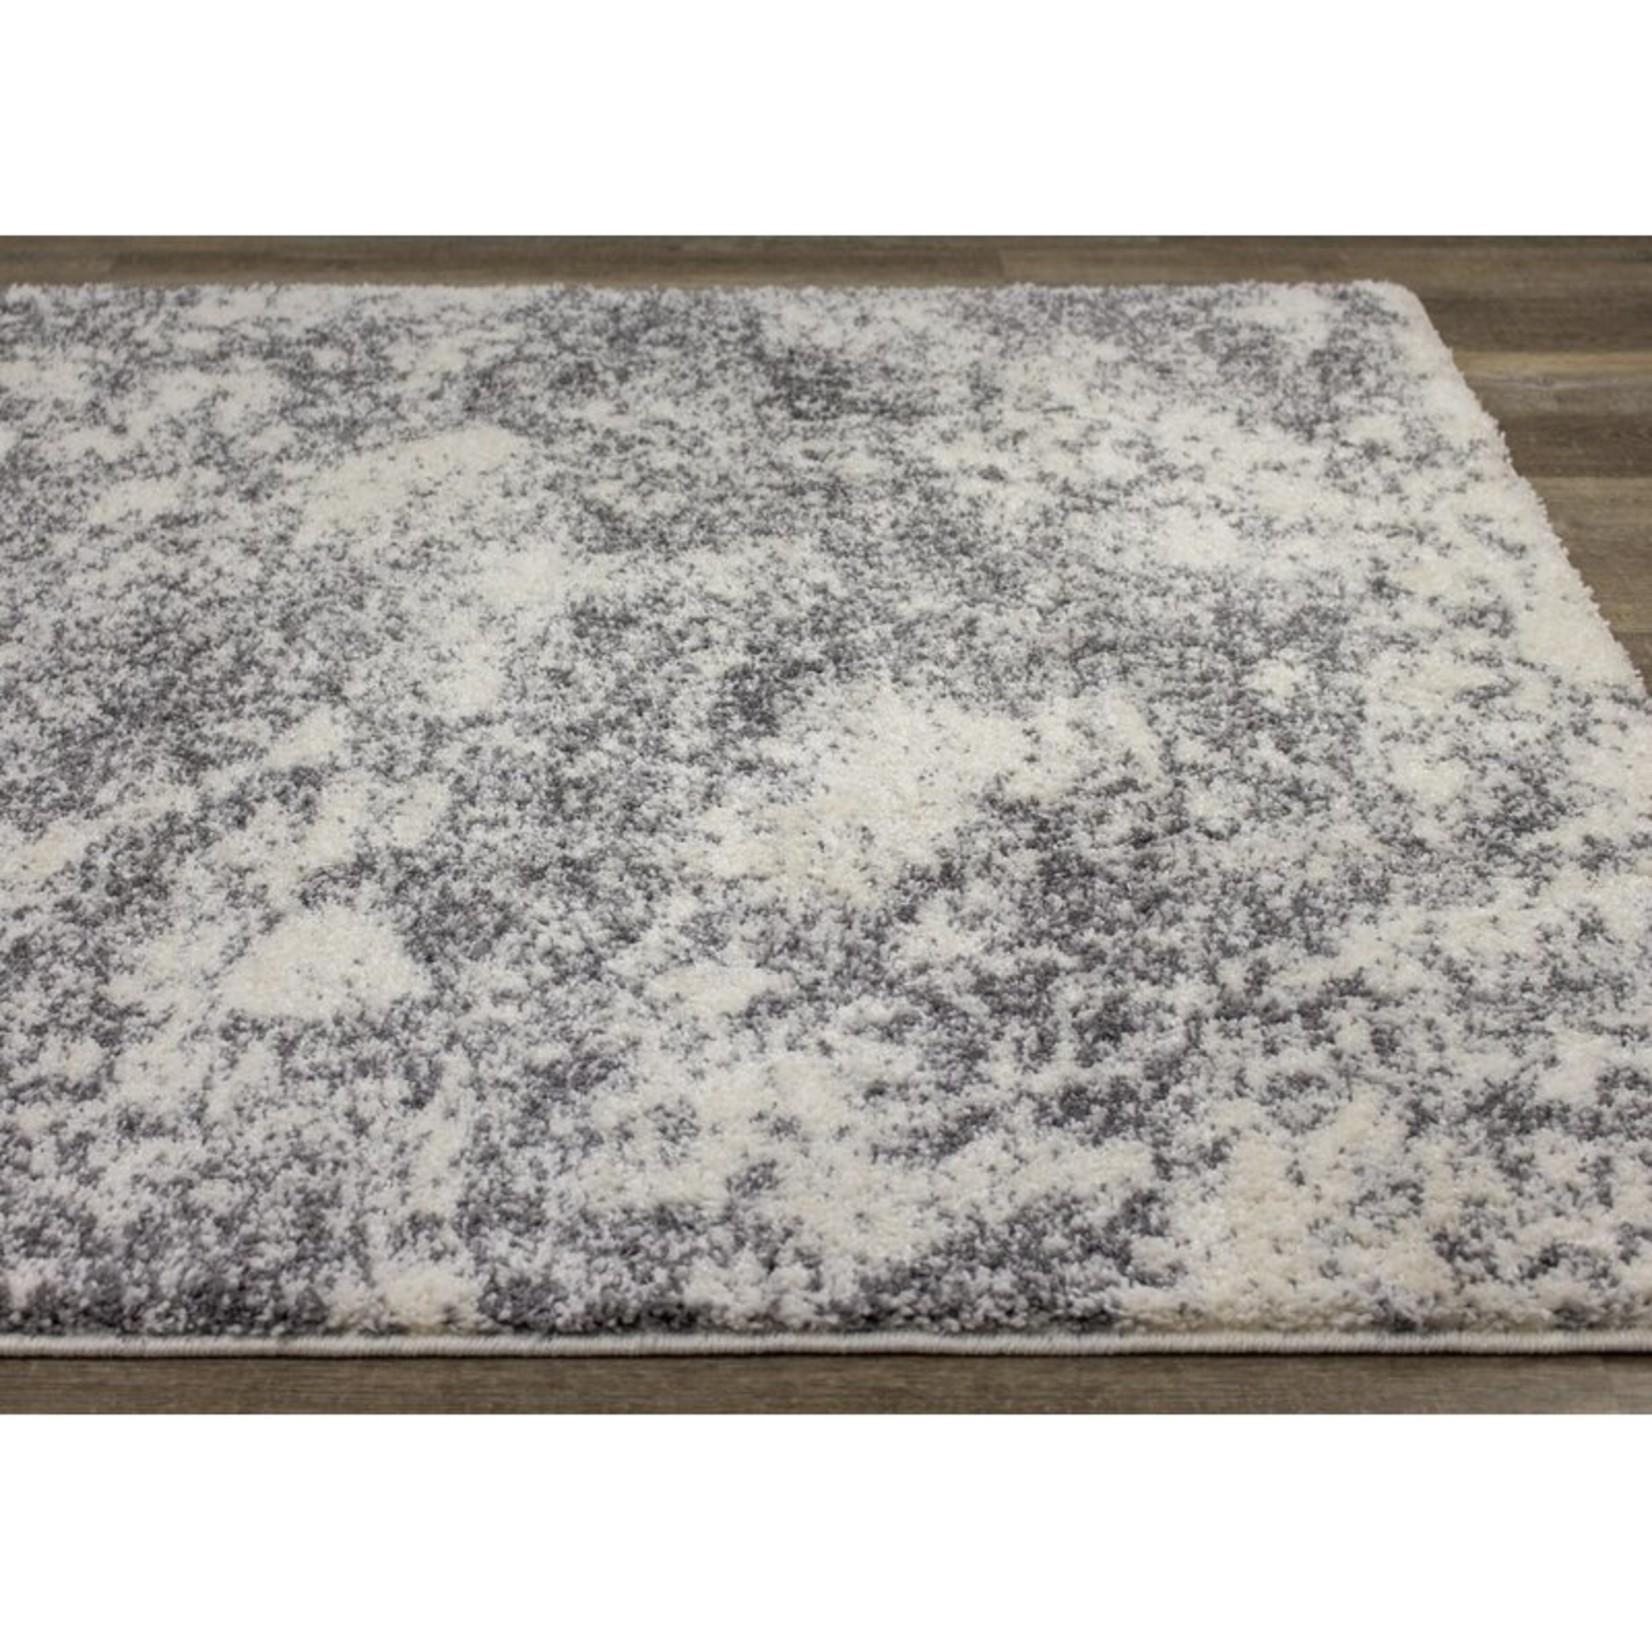 "*7'10"" x 10'6"" - Agnesse Power Loom White/Black Rug"